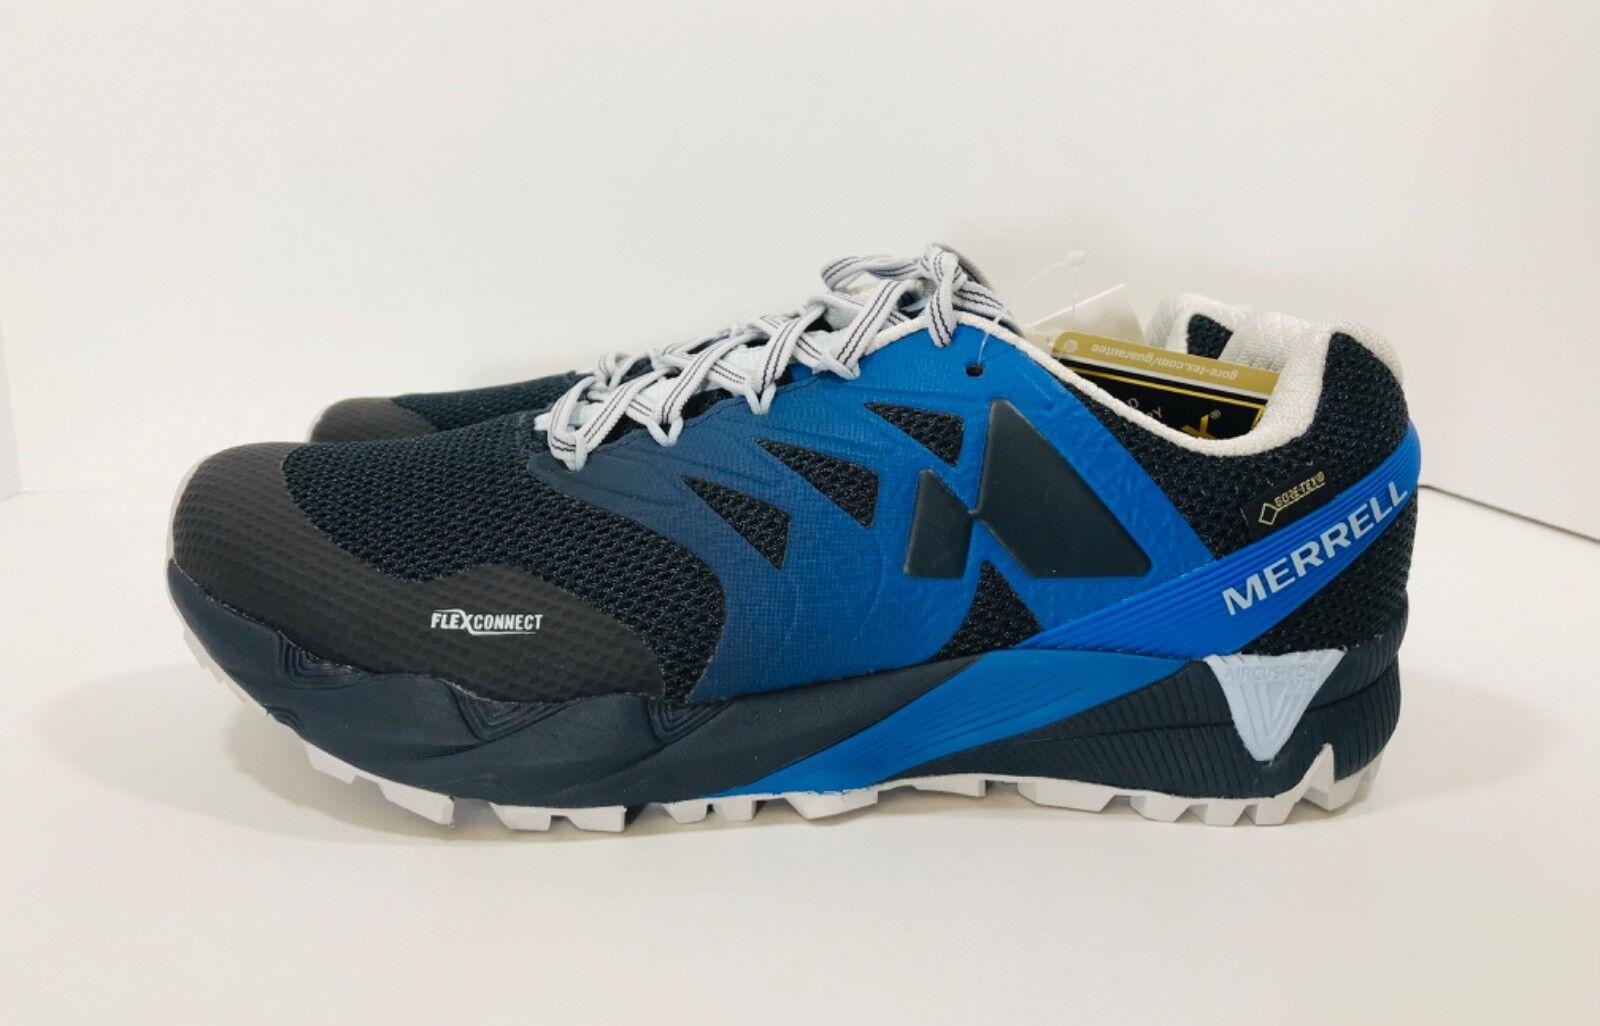 New New New Merrell Agility Peak Flex Gore-Tex Men's Size 9.5 Hiking shoes J598379 a7d1f6